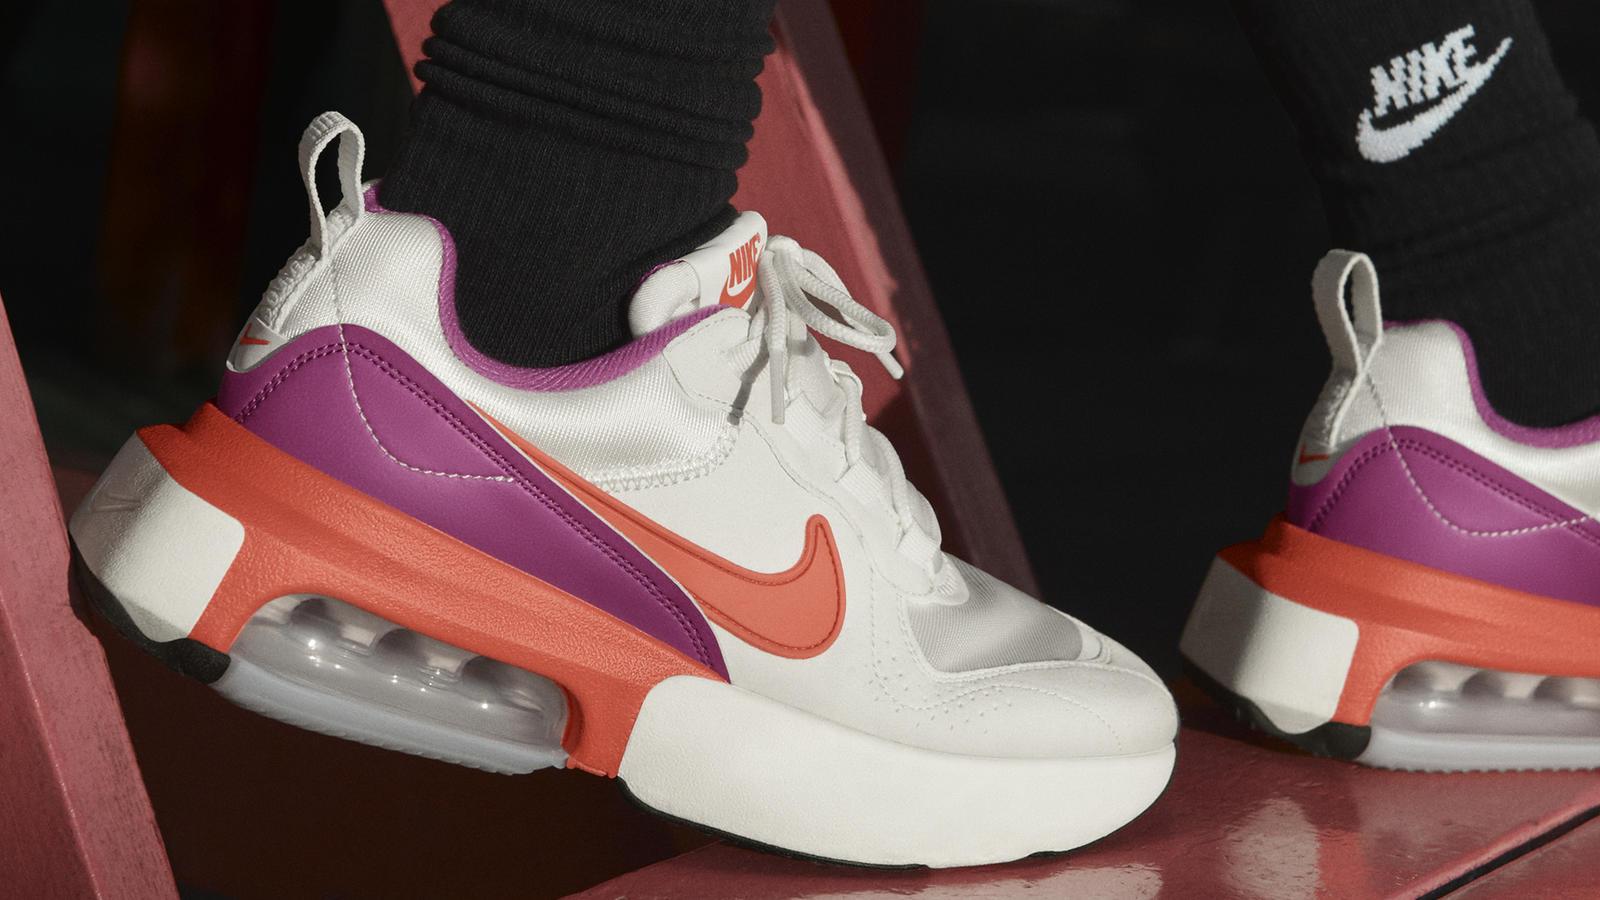 Nike Air Max Verona Summer 2020 7